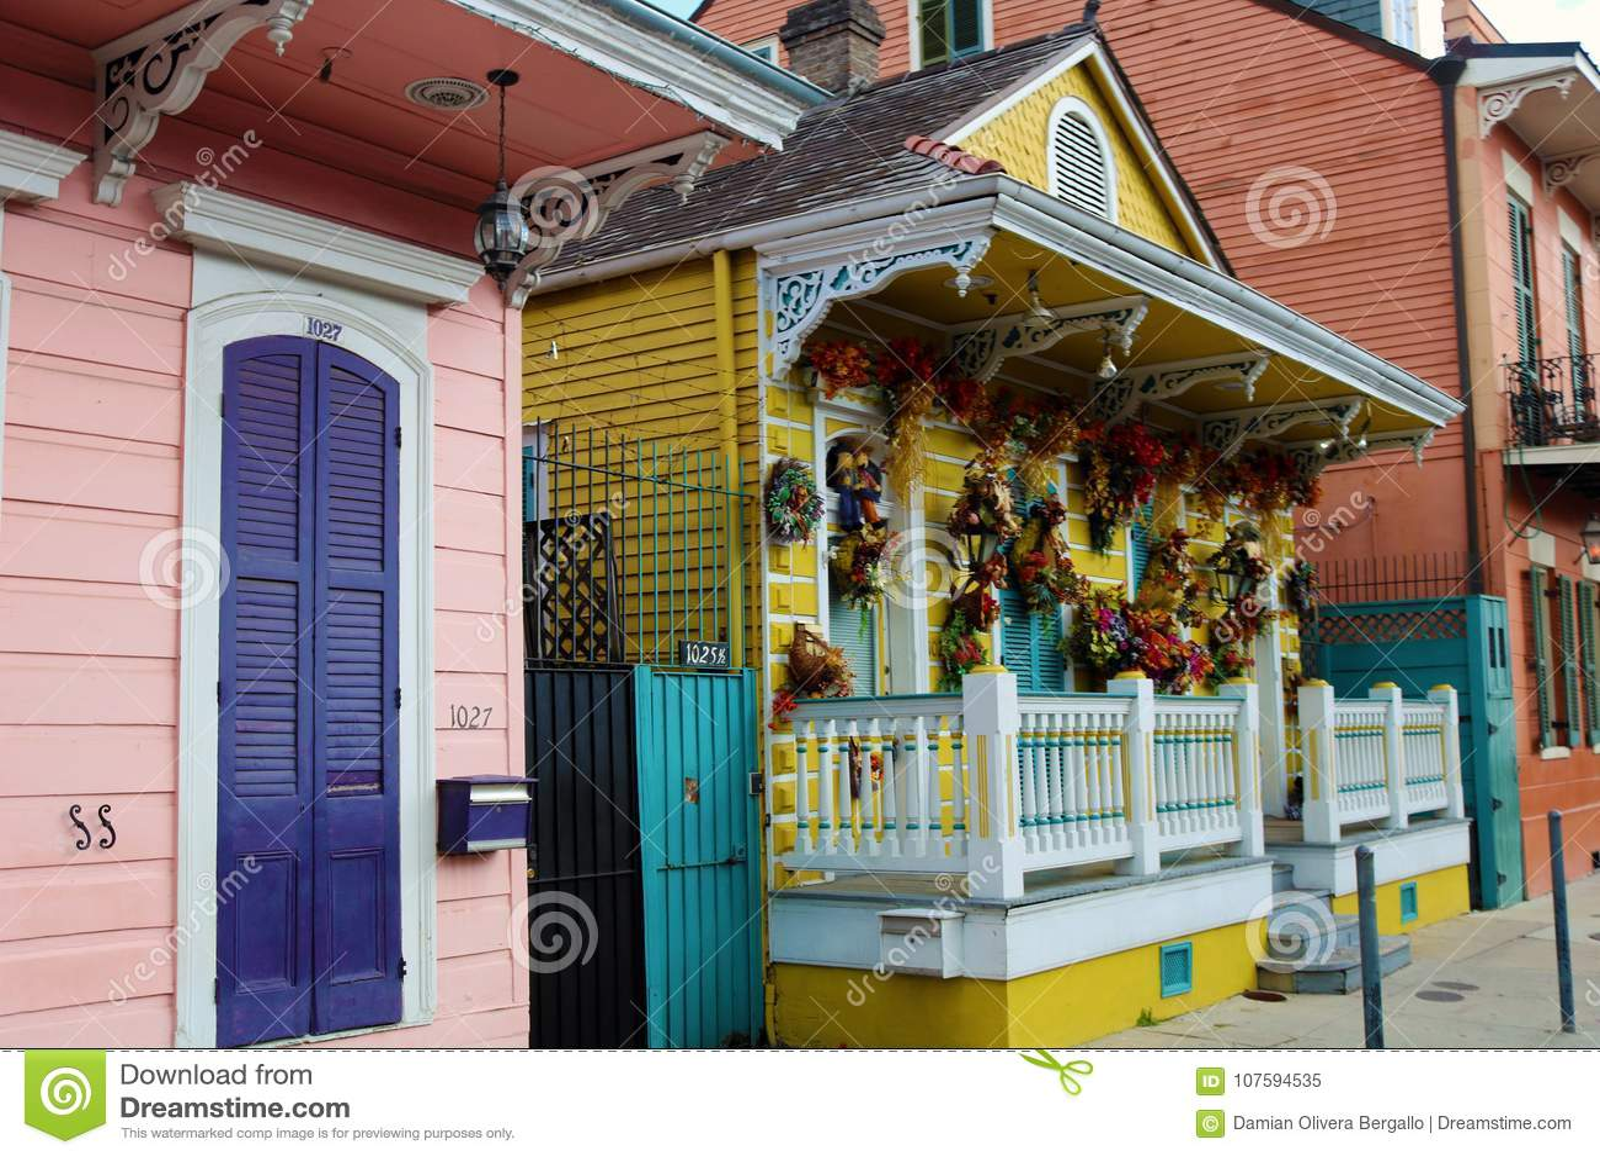 New orleans french quarter colorful house classic unique architecture